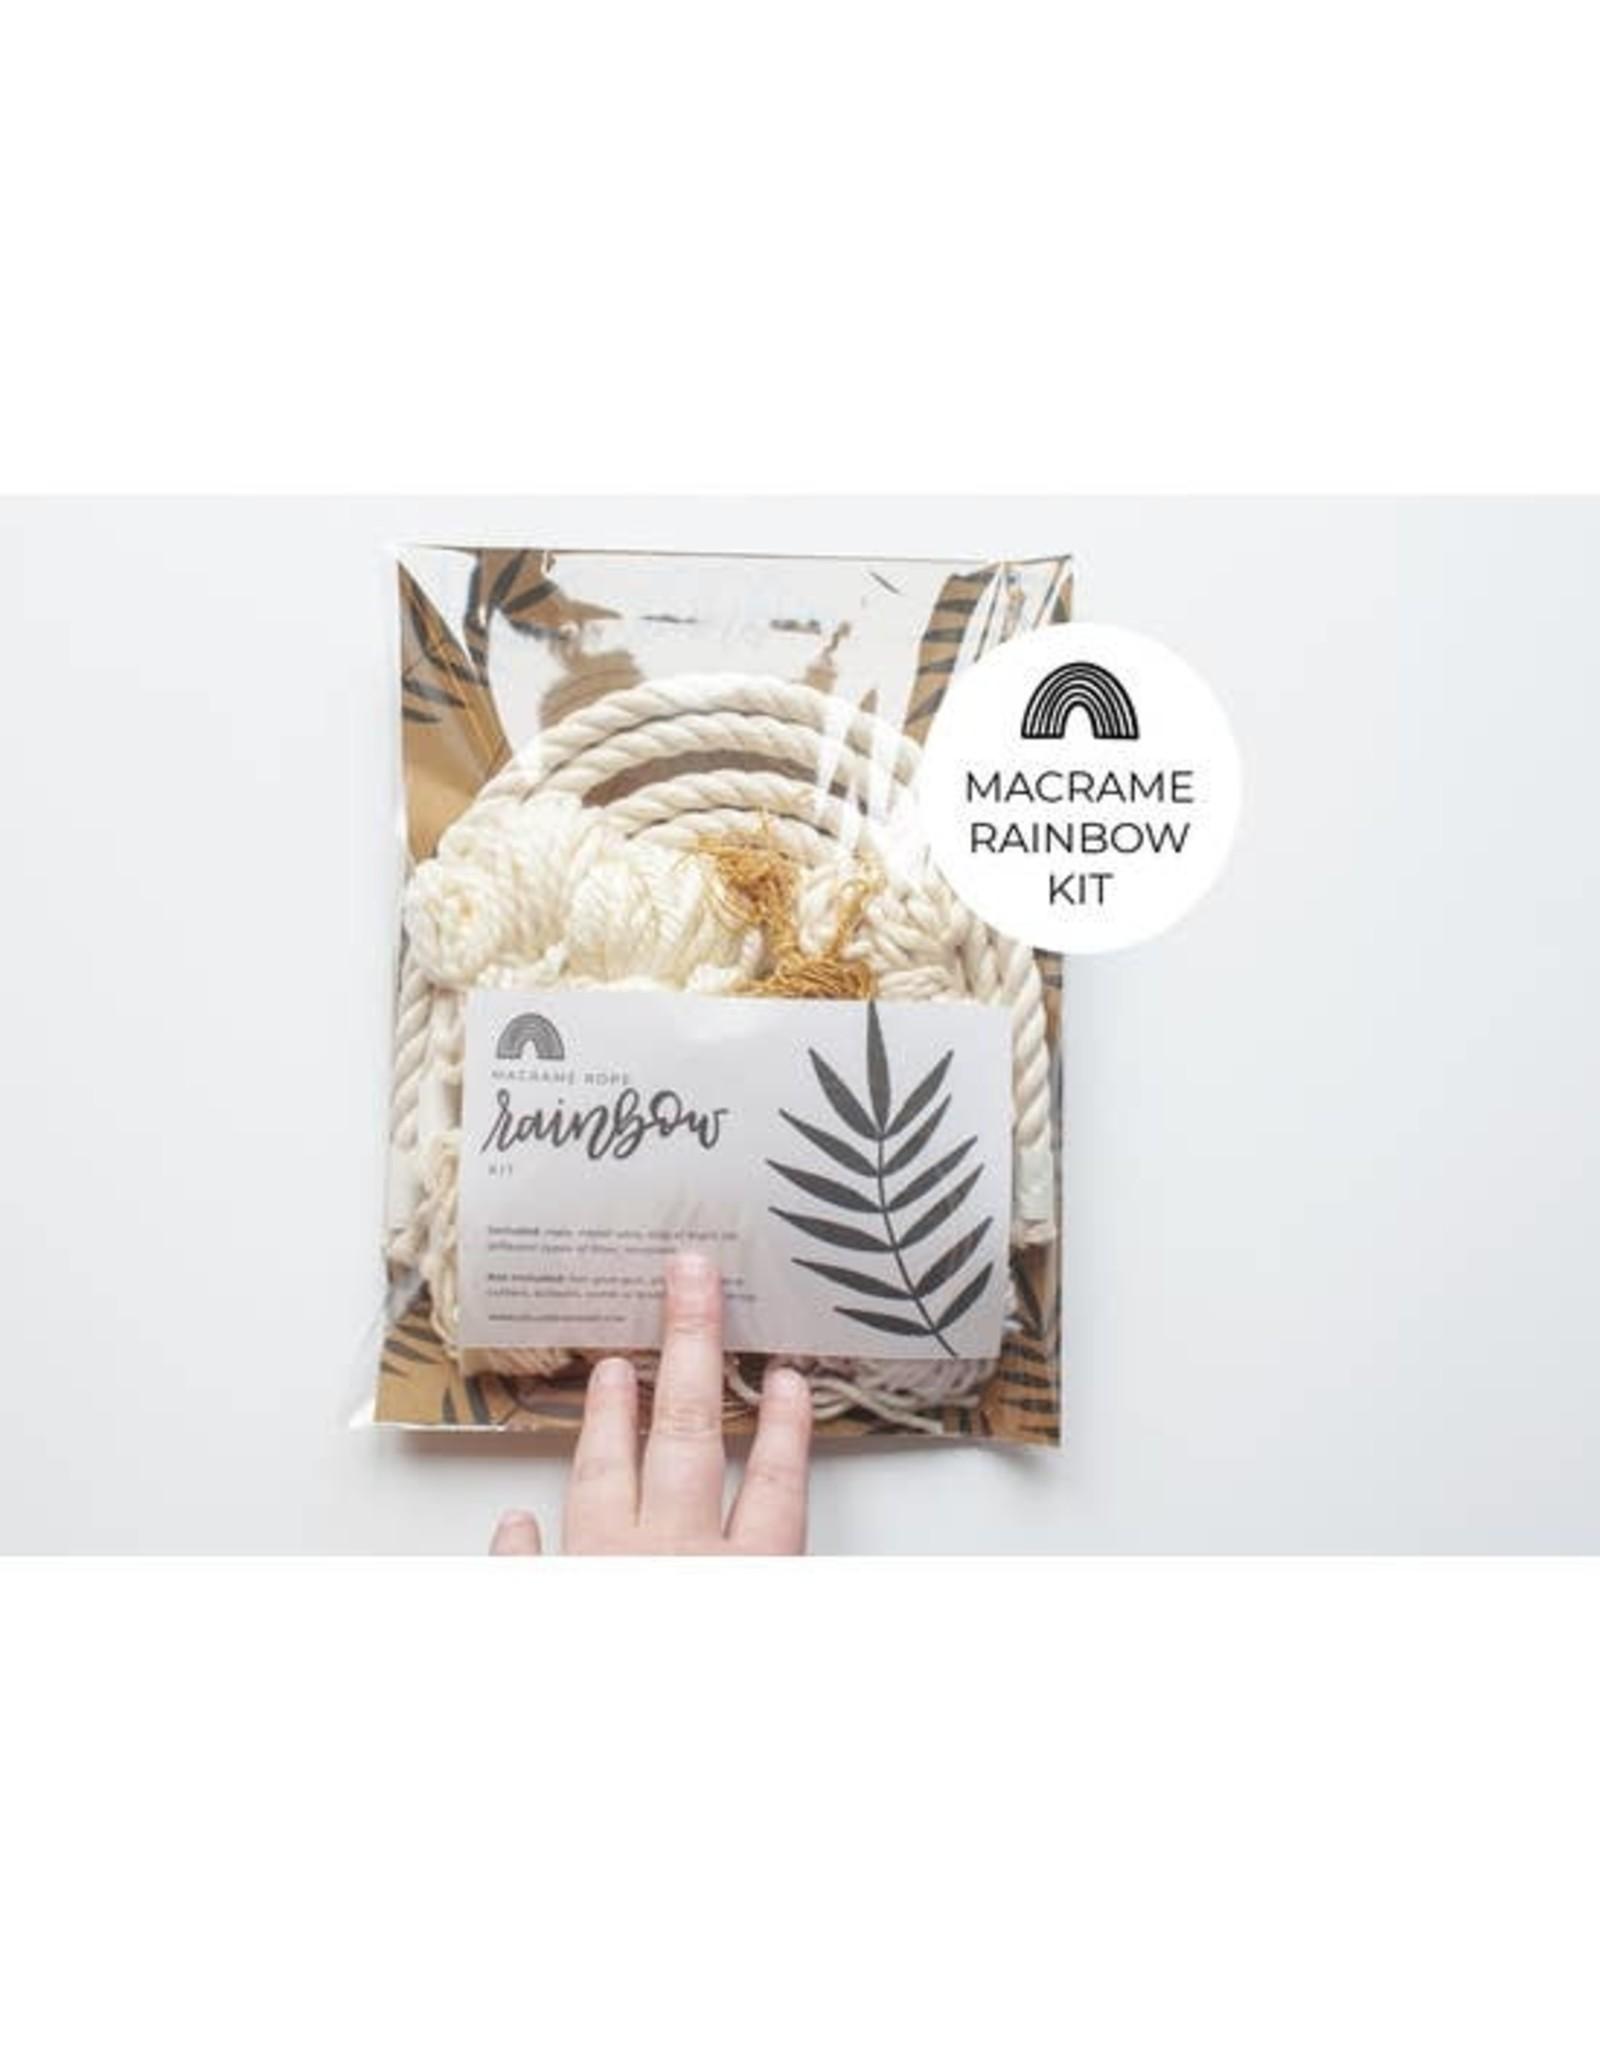 Hello Dear Heart Macrame Rainbow Kits: Neutral Cream